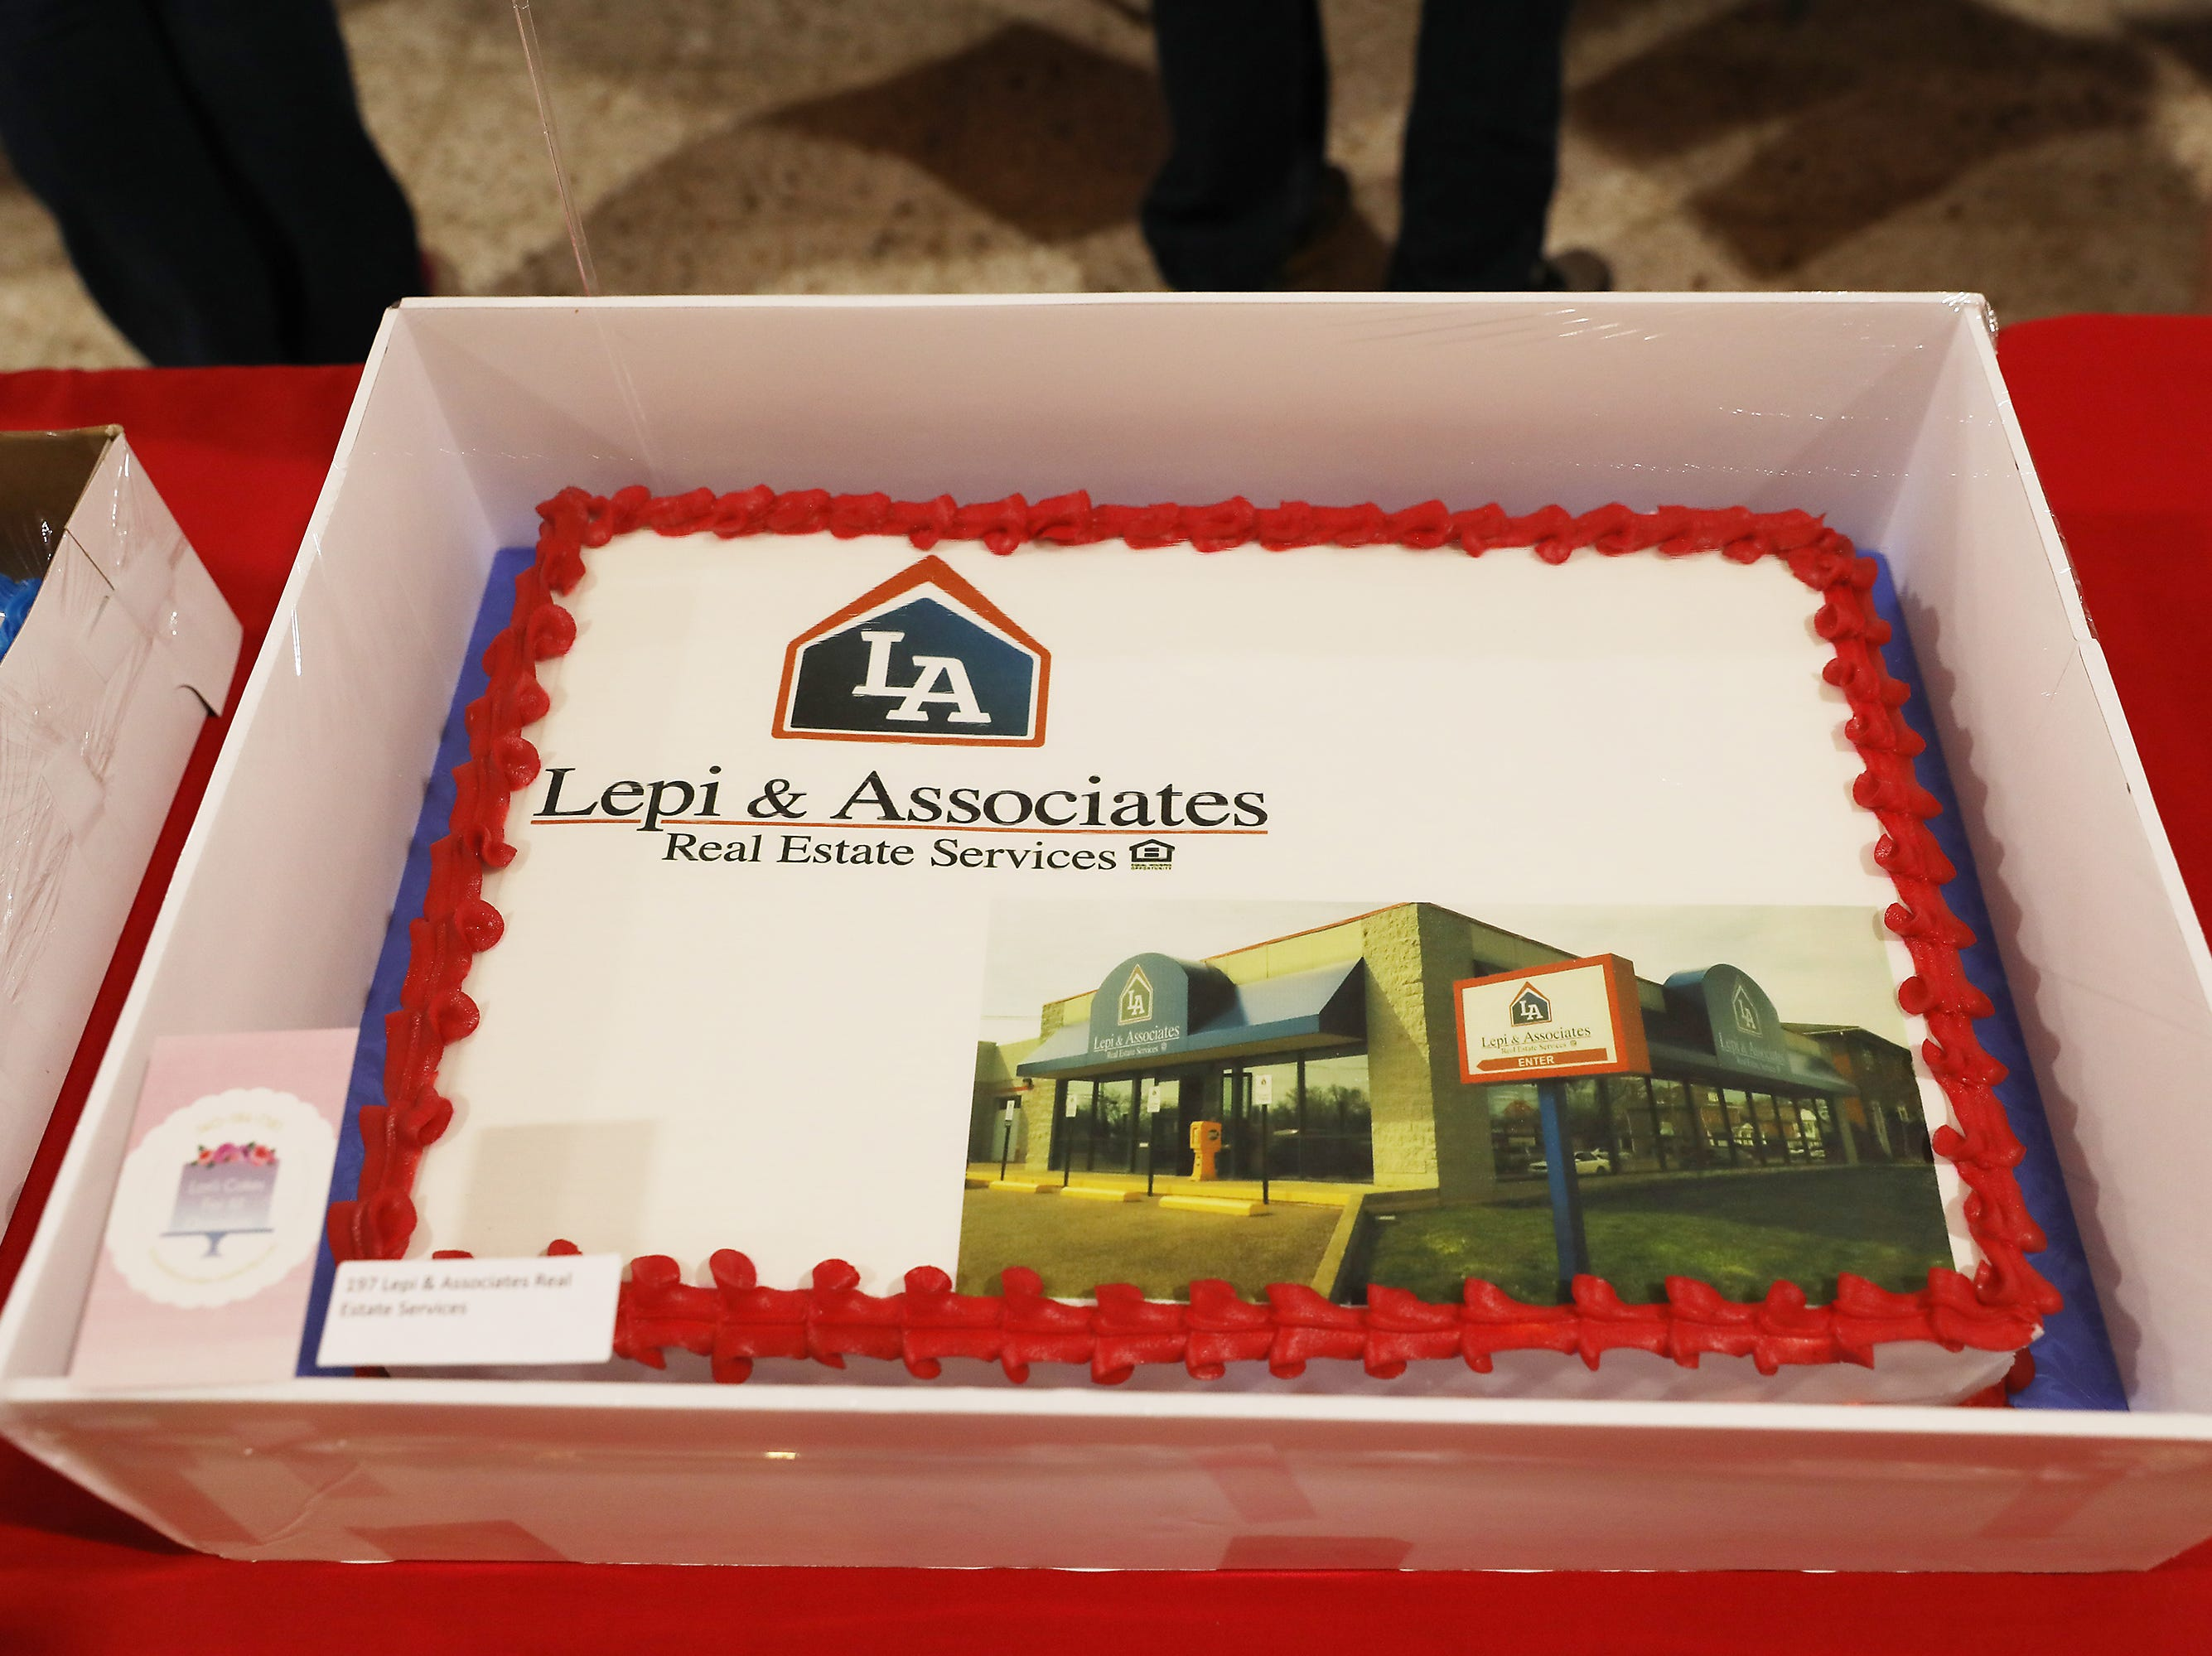 5:30 P.M. Thursday cake 197 Lepi & Associates Real Estate Services - four $50 gift cards to local restaurants